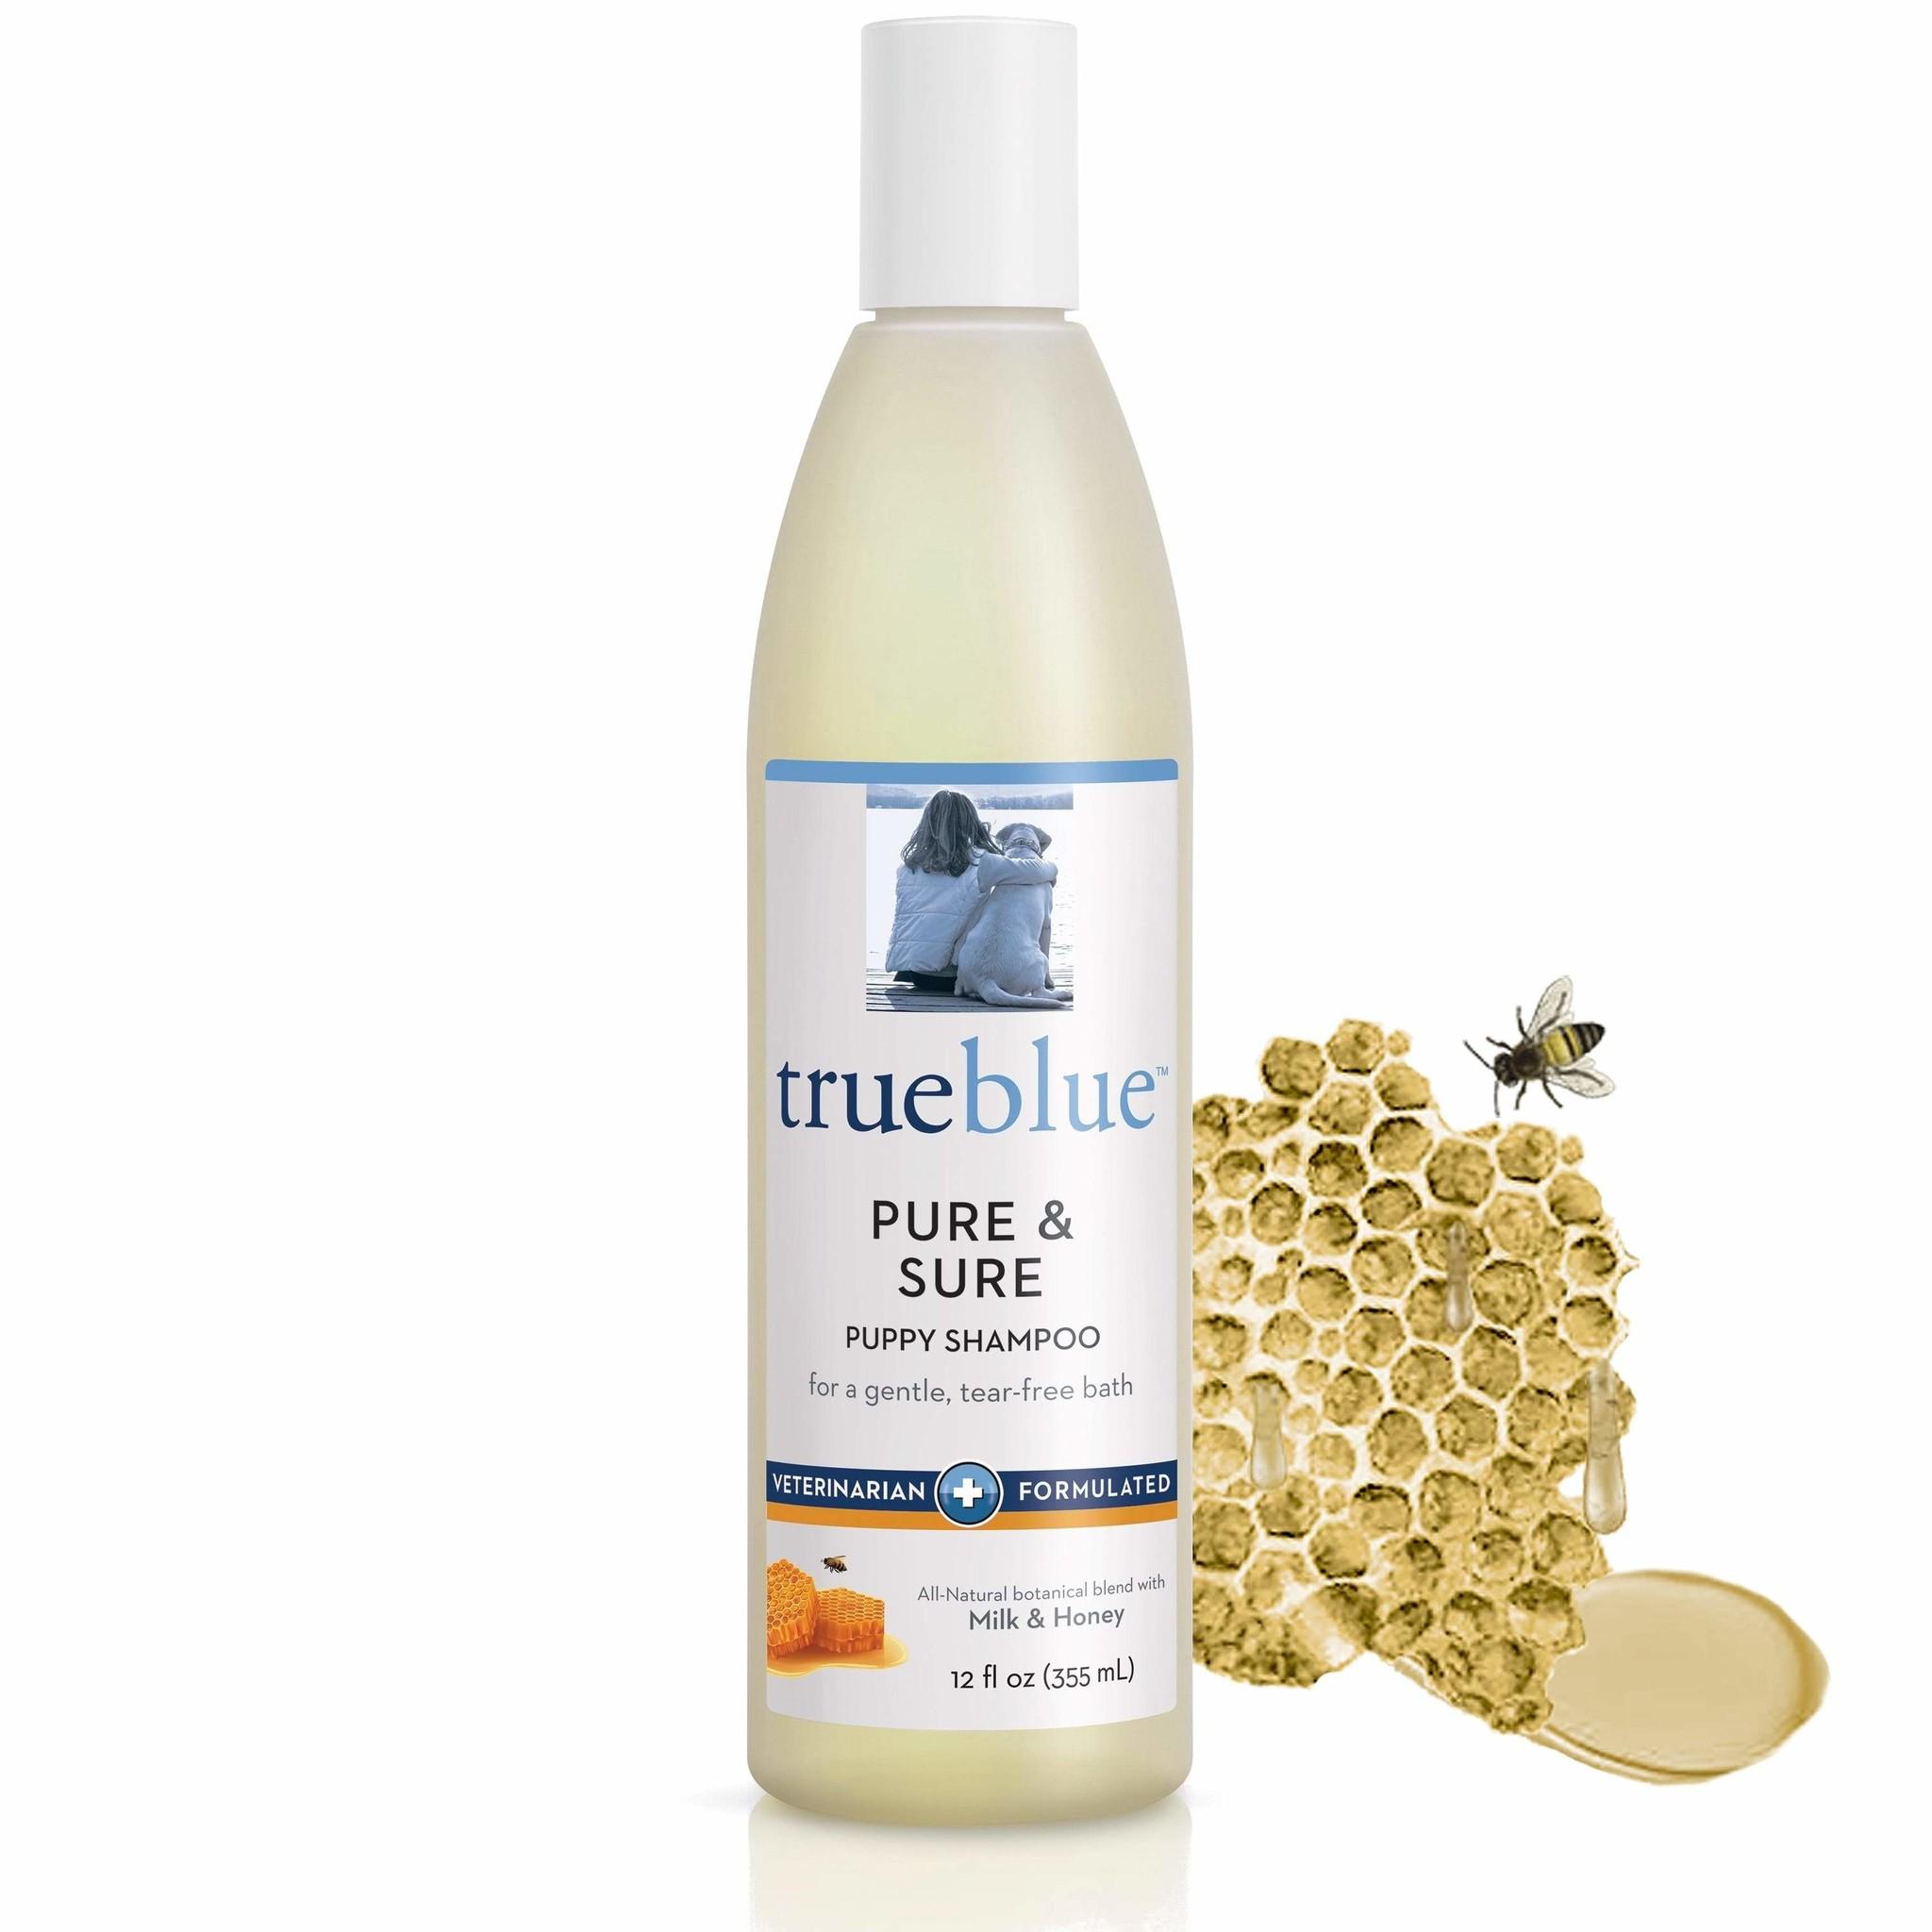 TrueBlue TrueBlue Puppy Shampoo